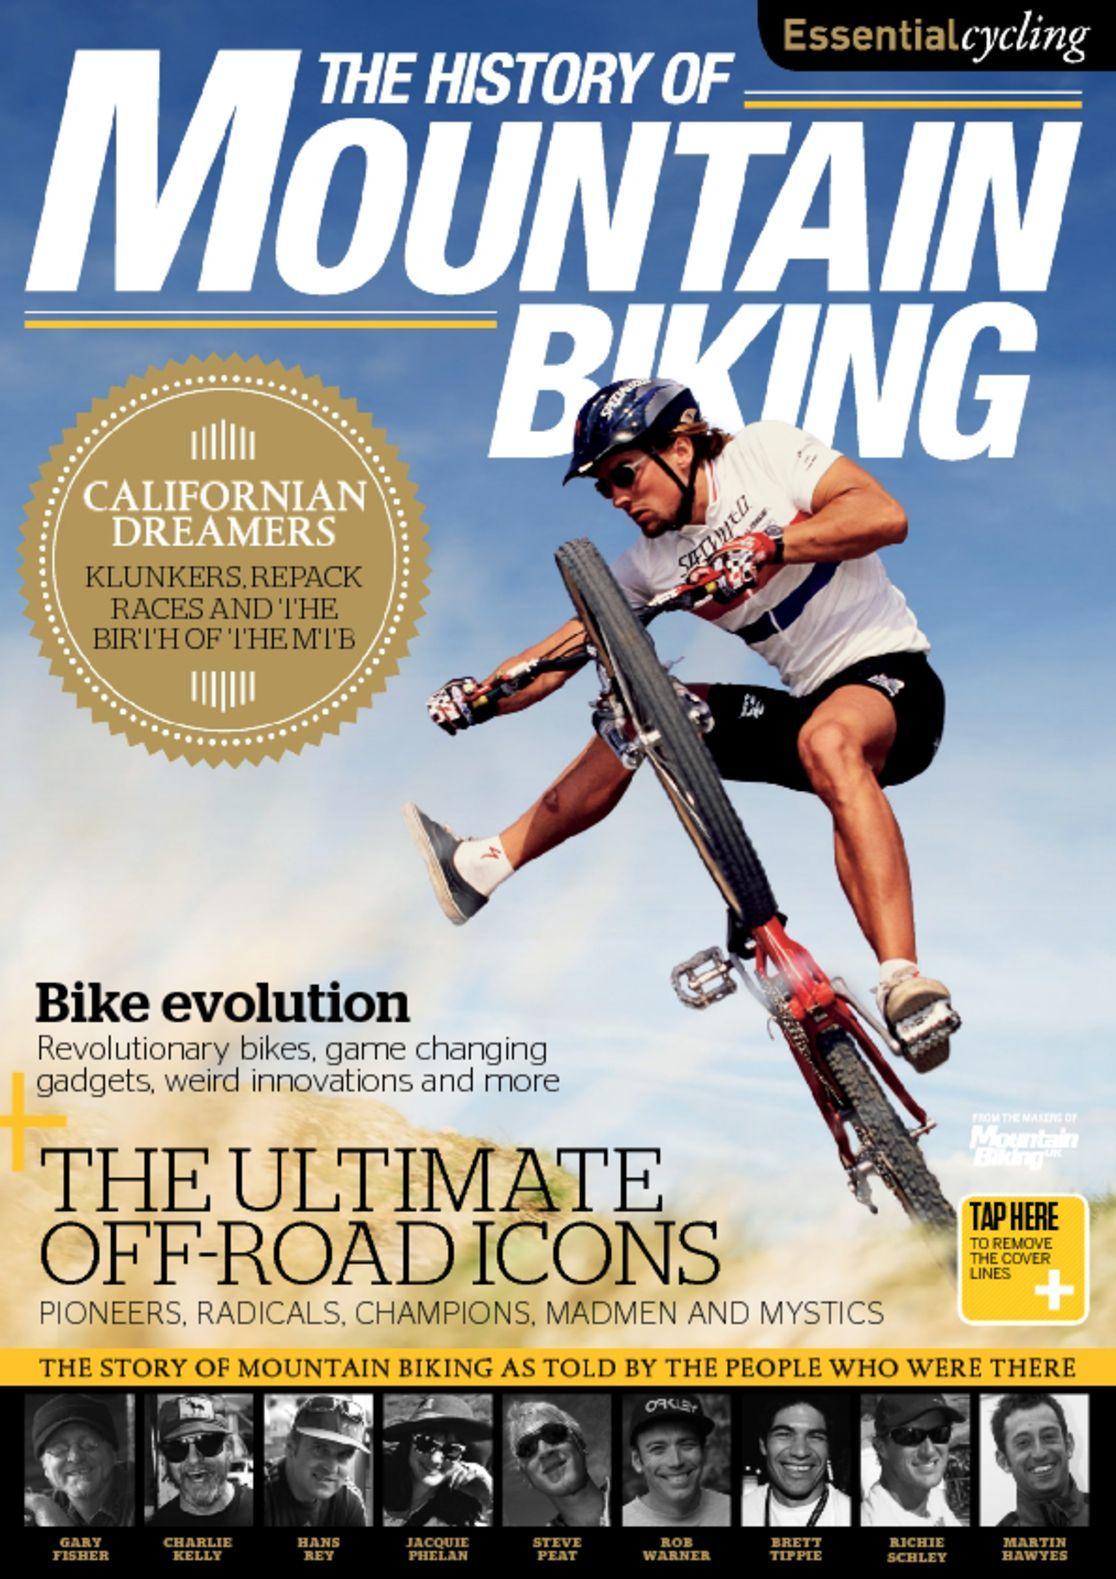 The History of Mountain Biking Digital